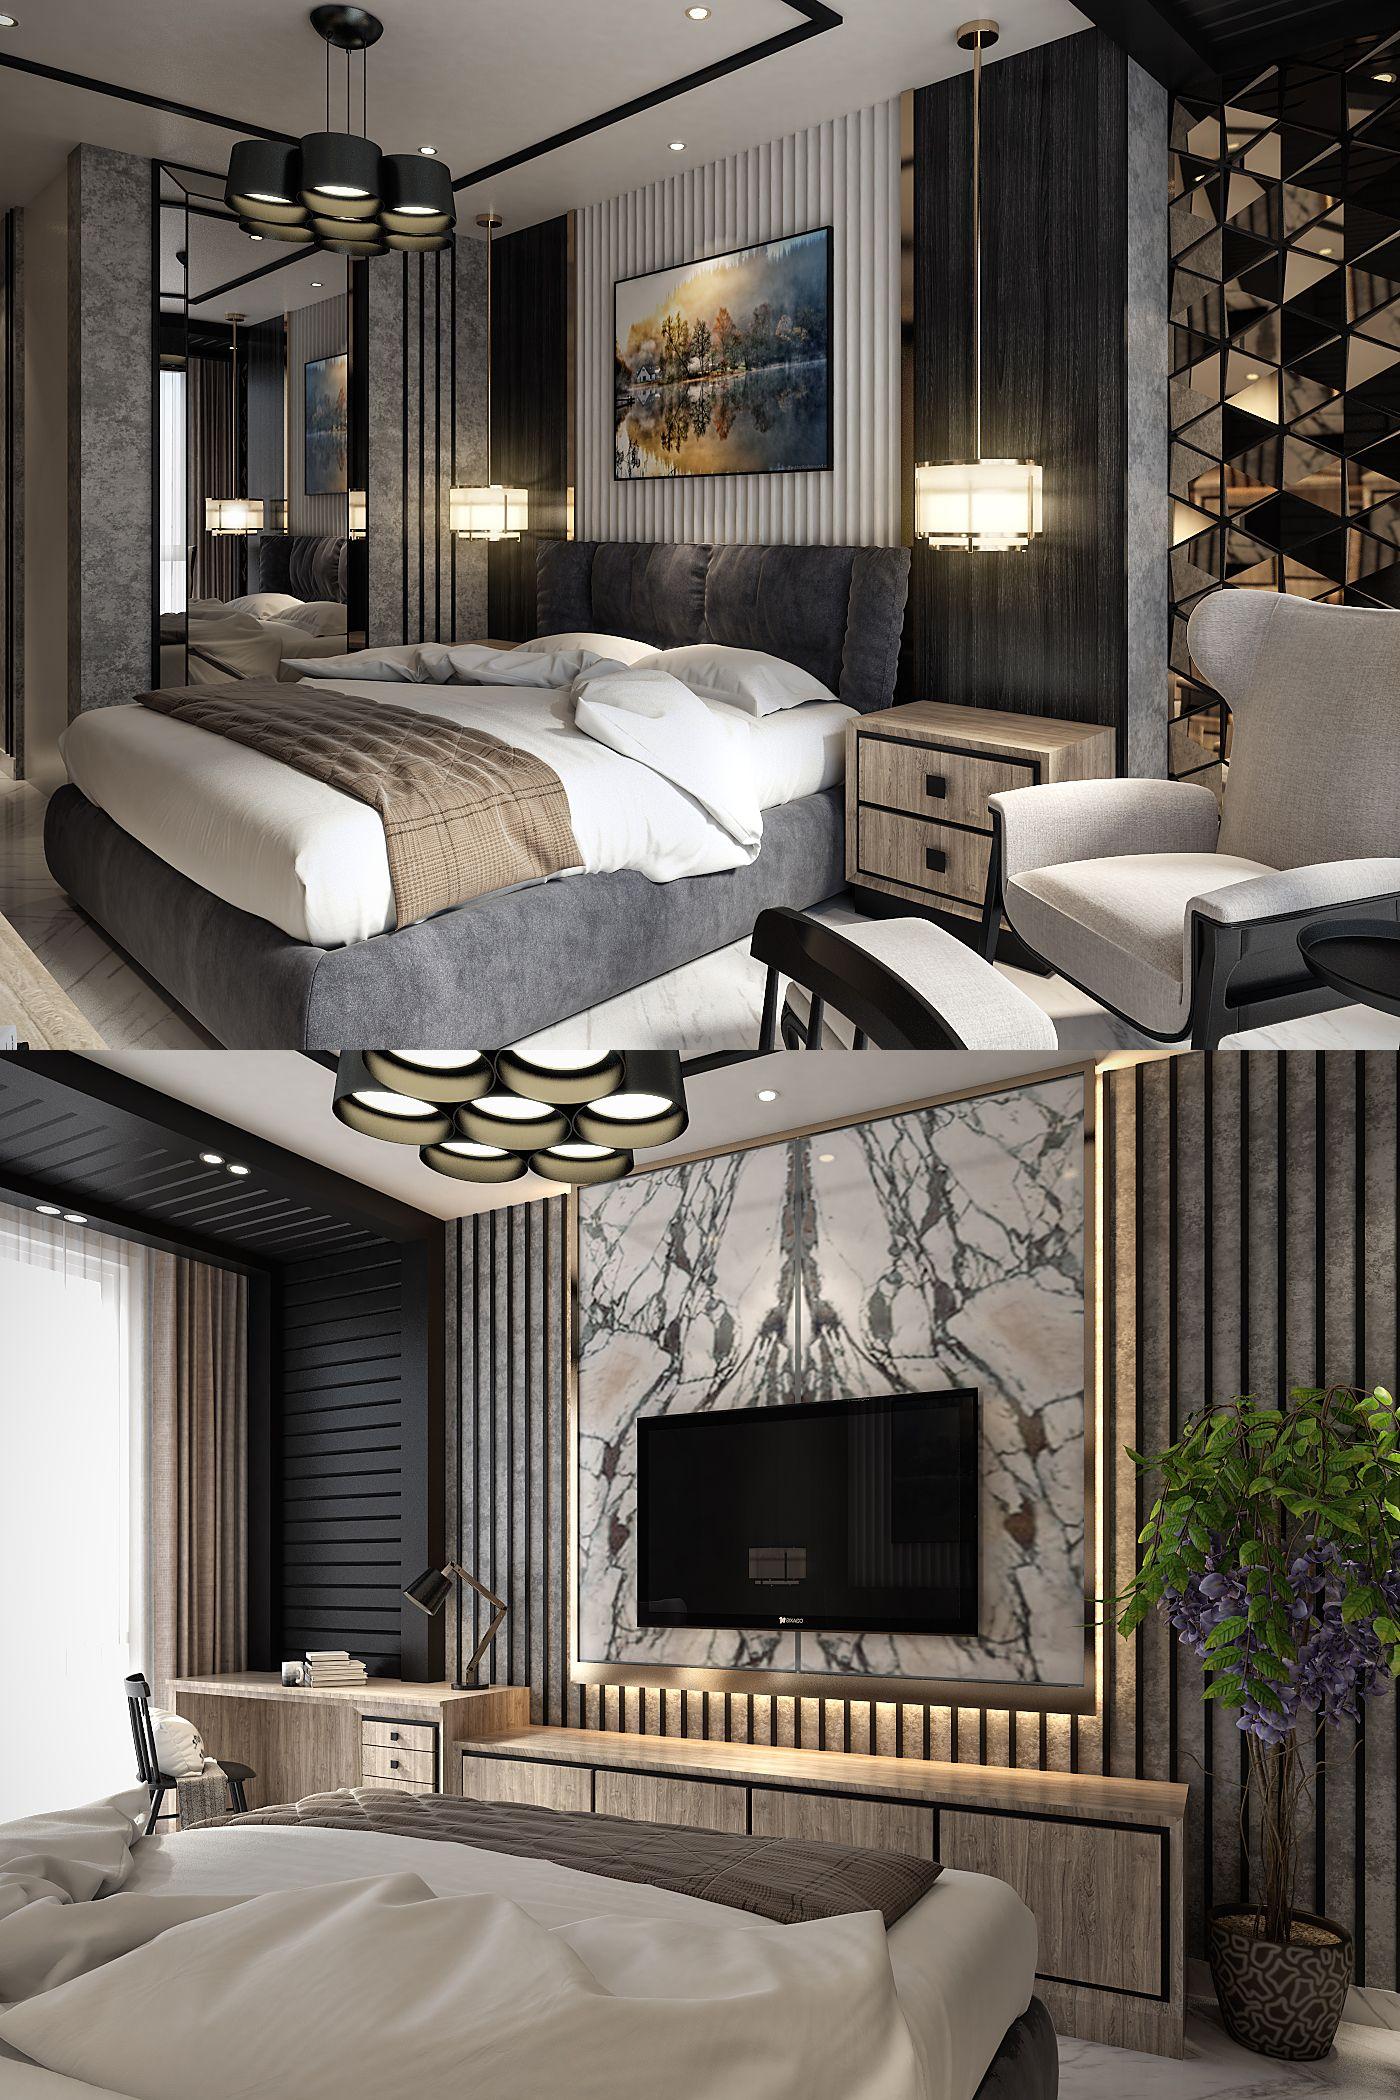 Bedroom Luxury Interior Design Luxurious Bedrooms Luxury Bedroom Decor Hotel Room Interior